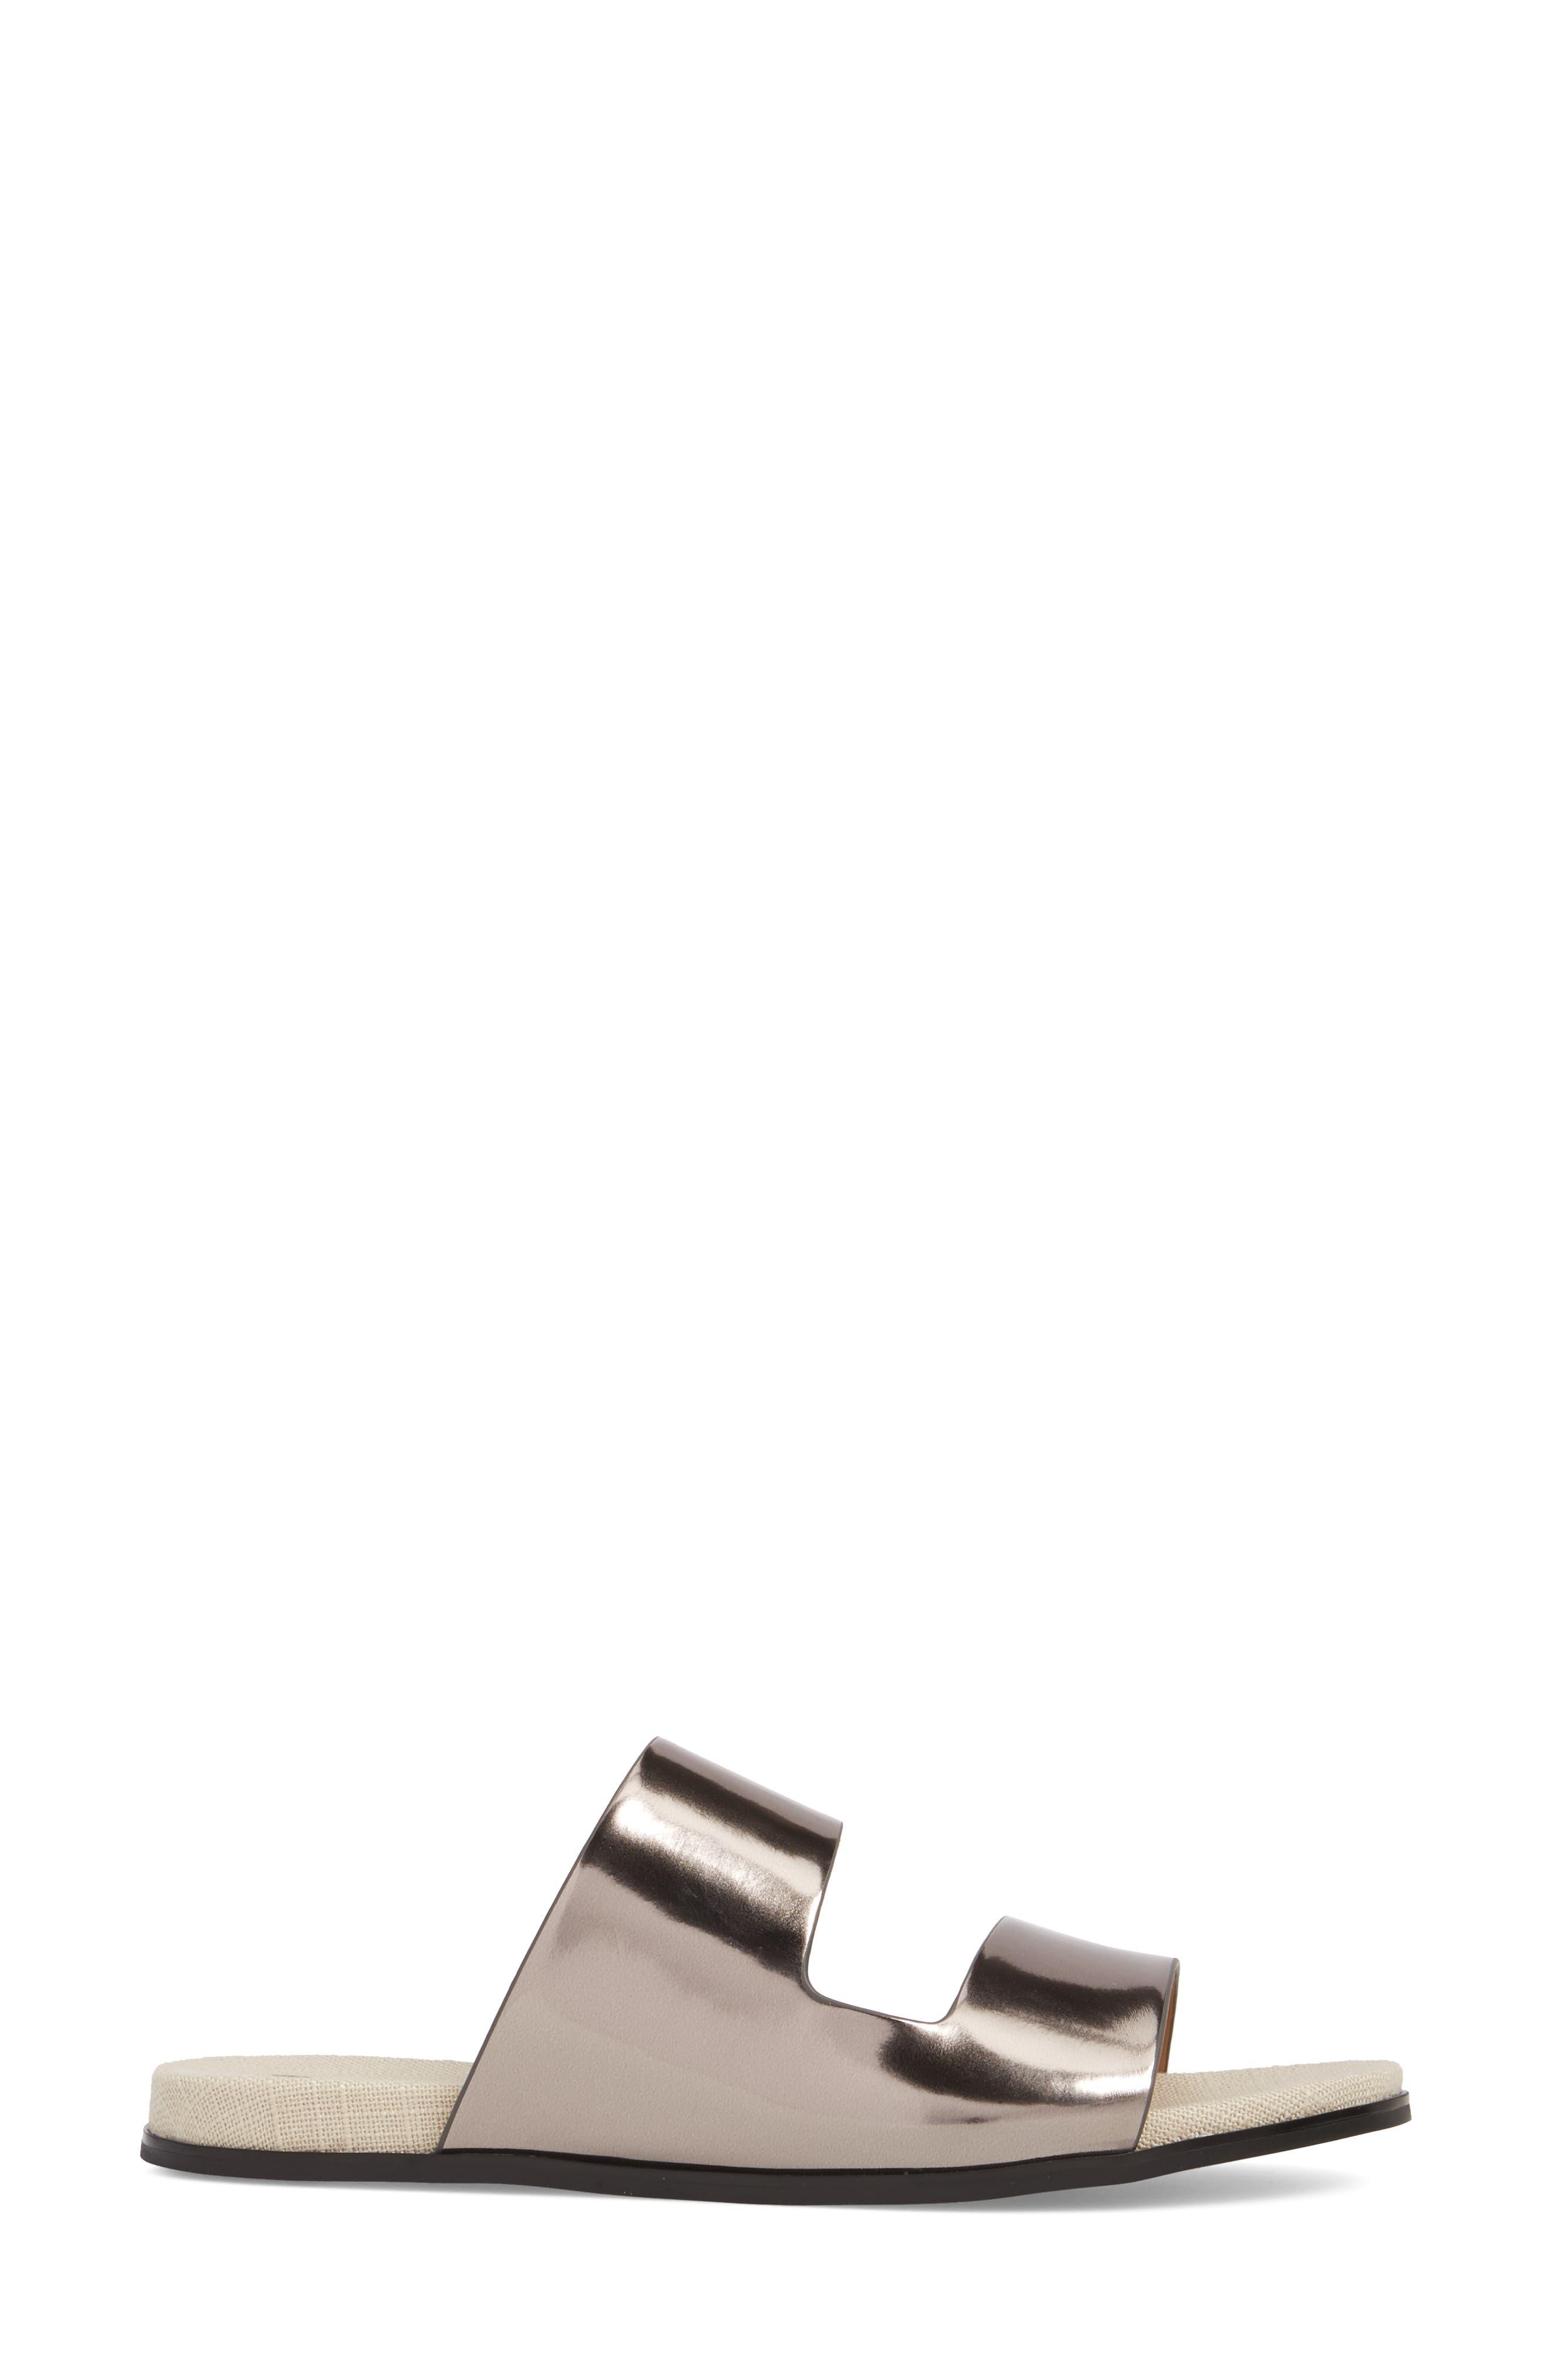 Posey Slide Sandal,                             Alternate thumbnail 3, color,                             Pewter Leather